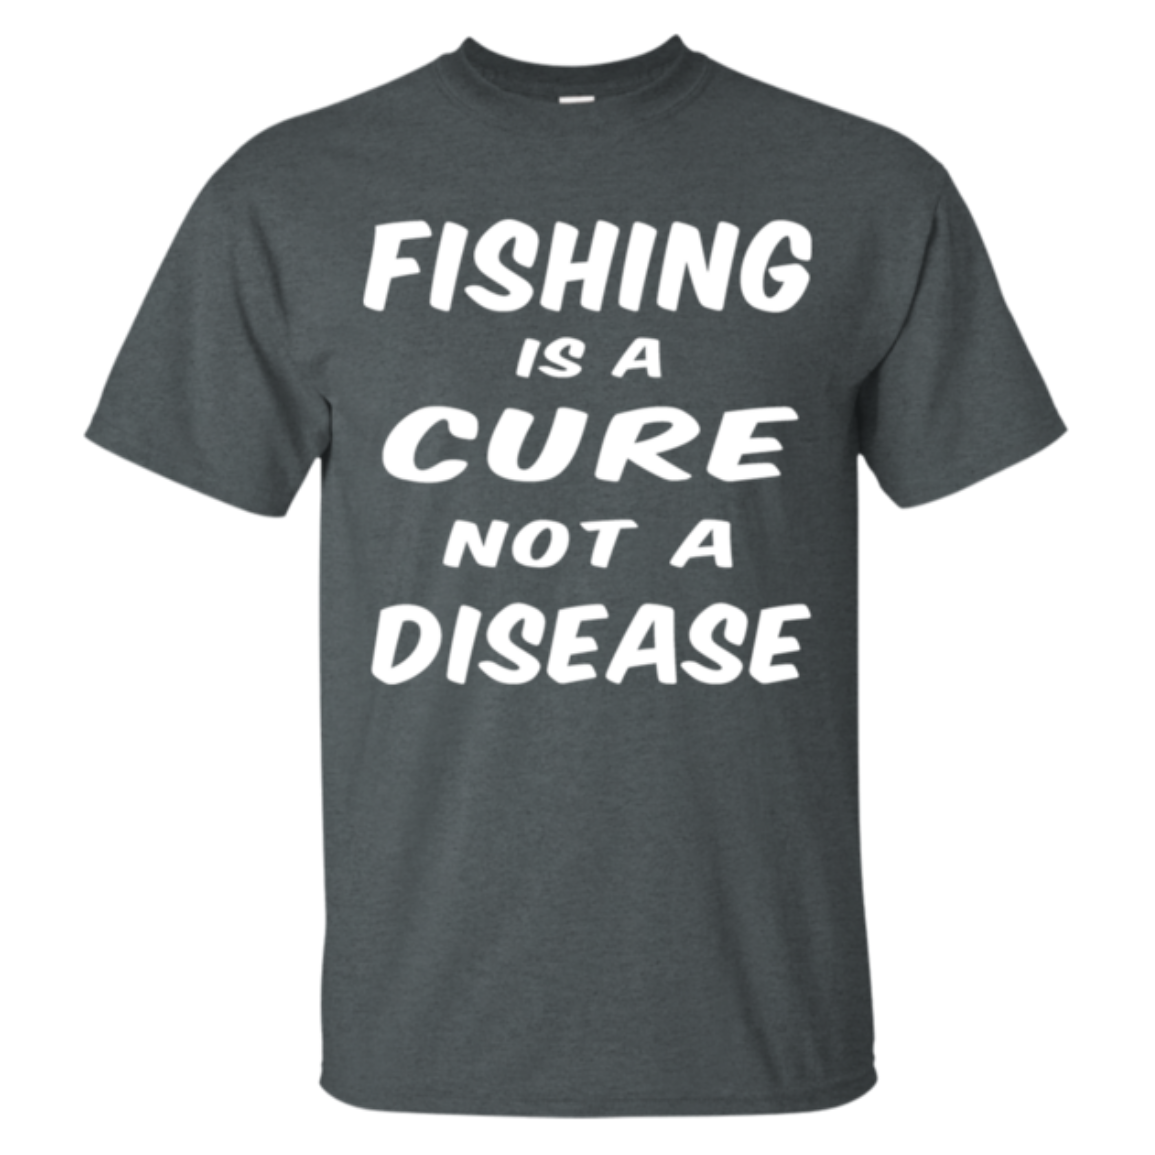 Fishing Is A Cure Not A Disease Shirt